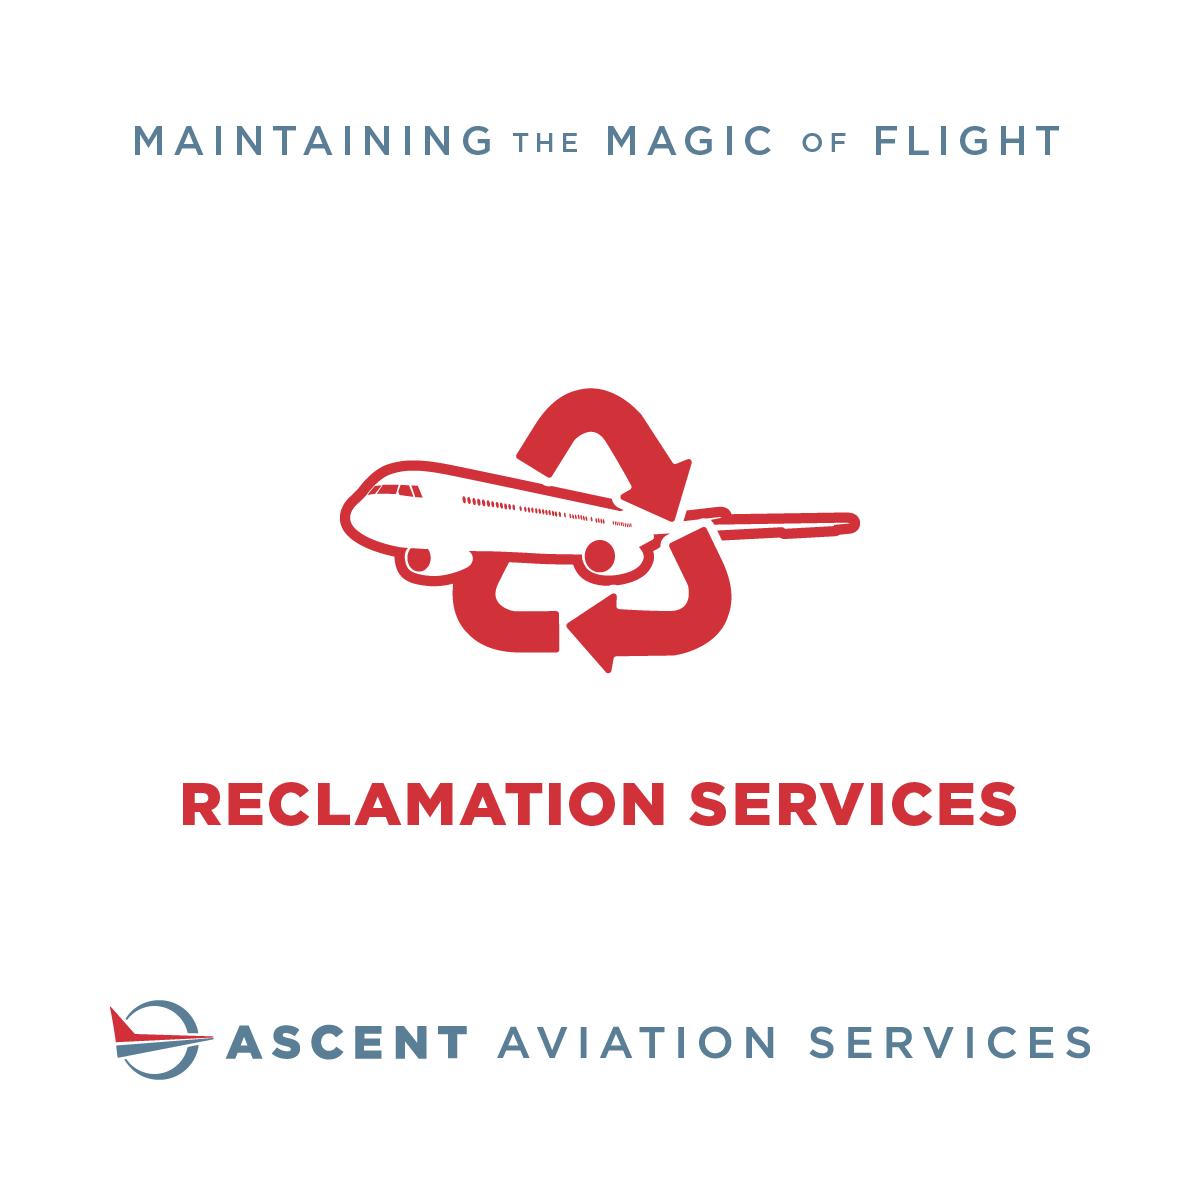 reclamation ascent aviation services. Black Bedroom Furniture Sets. Home Design Ideas